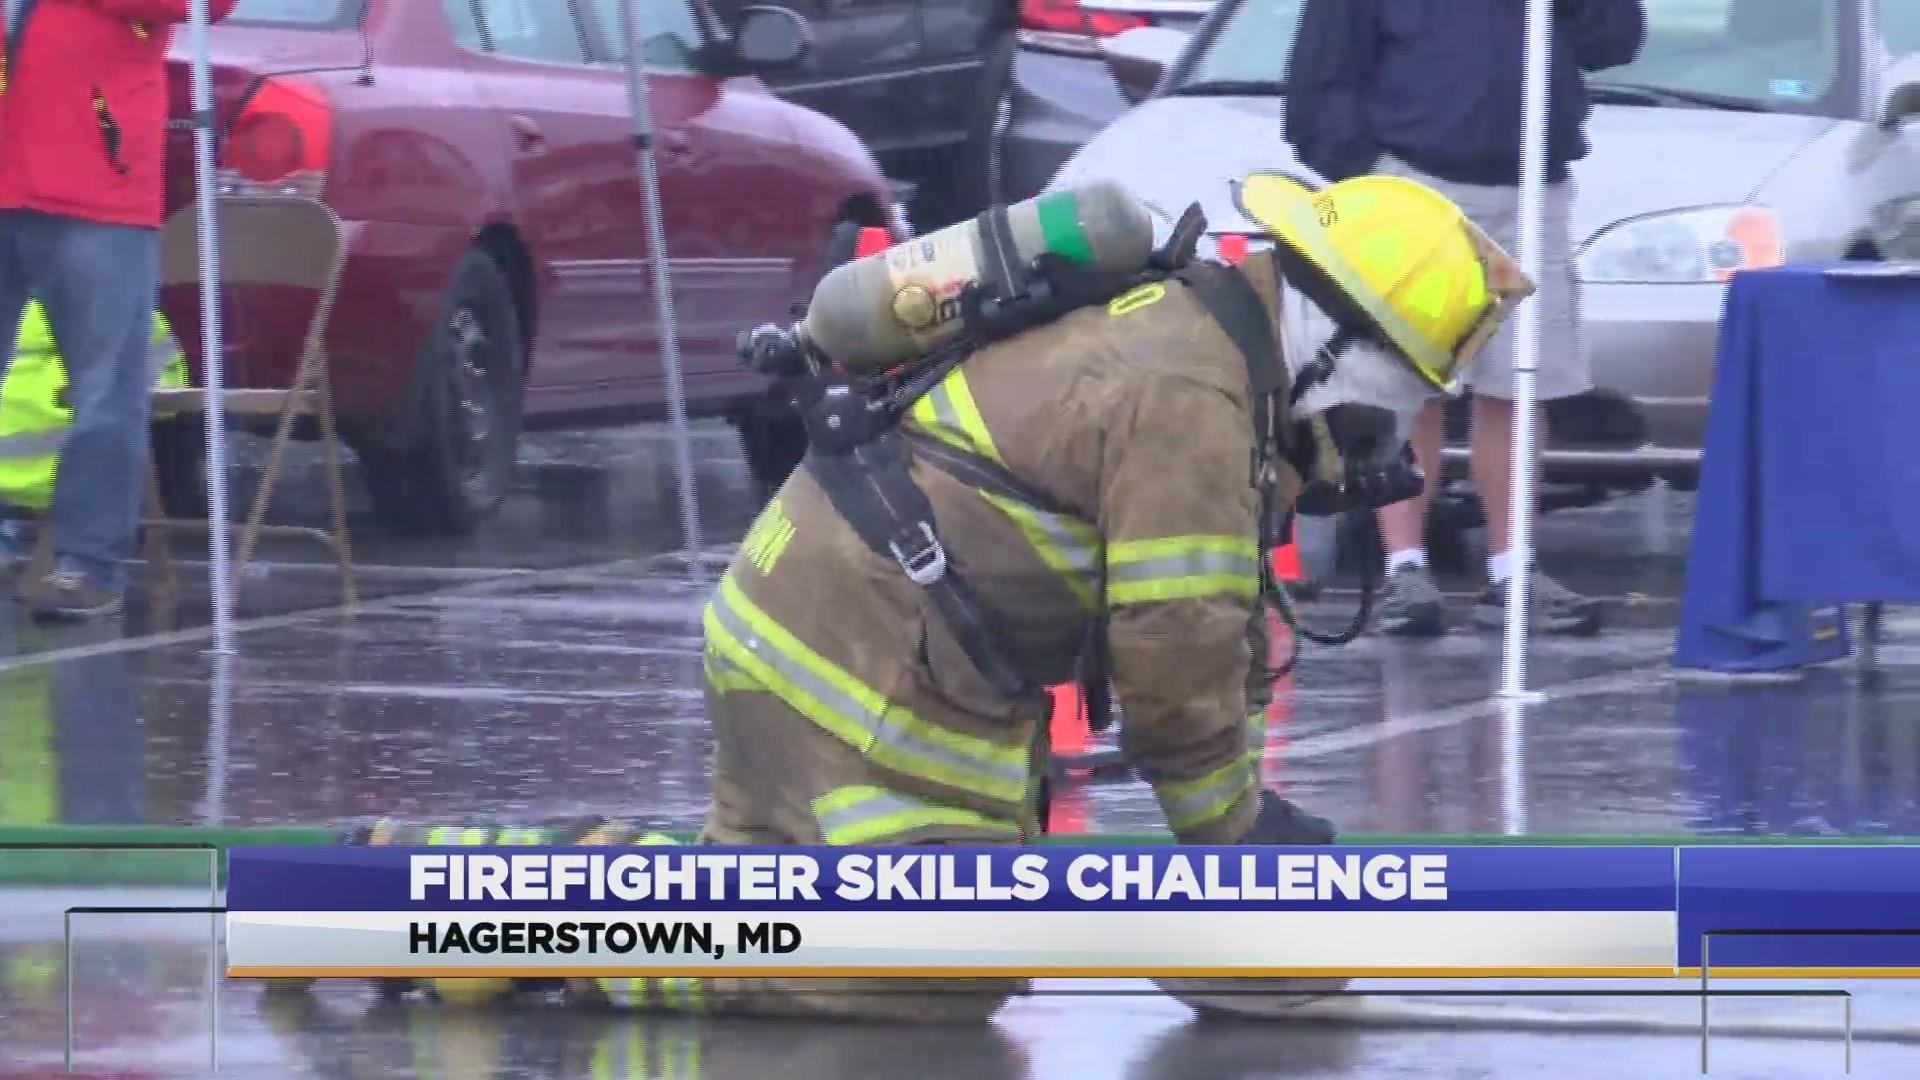 Firefighter_skills_challenge_0_20180506232047